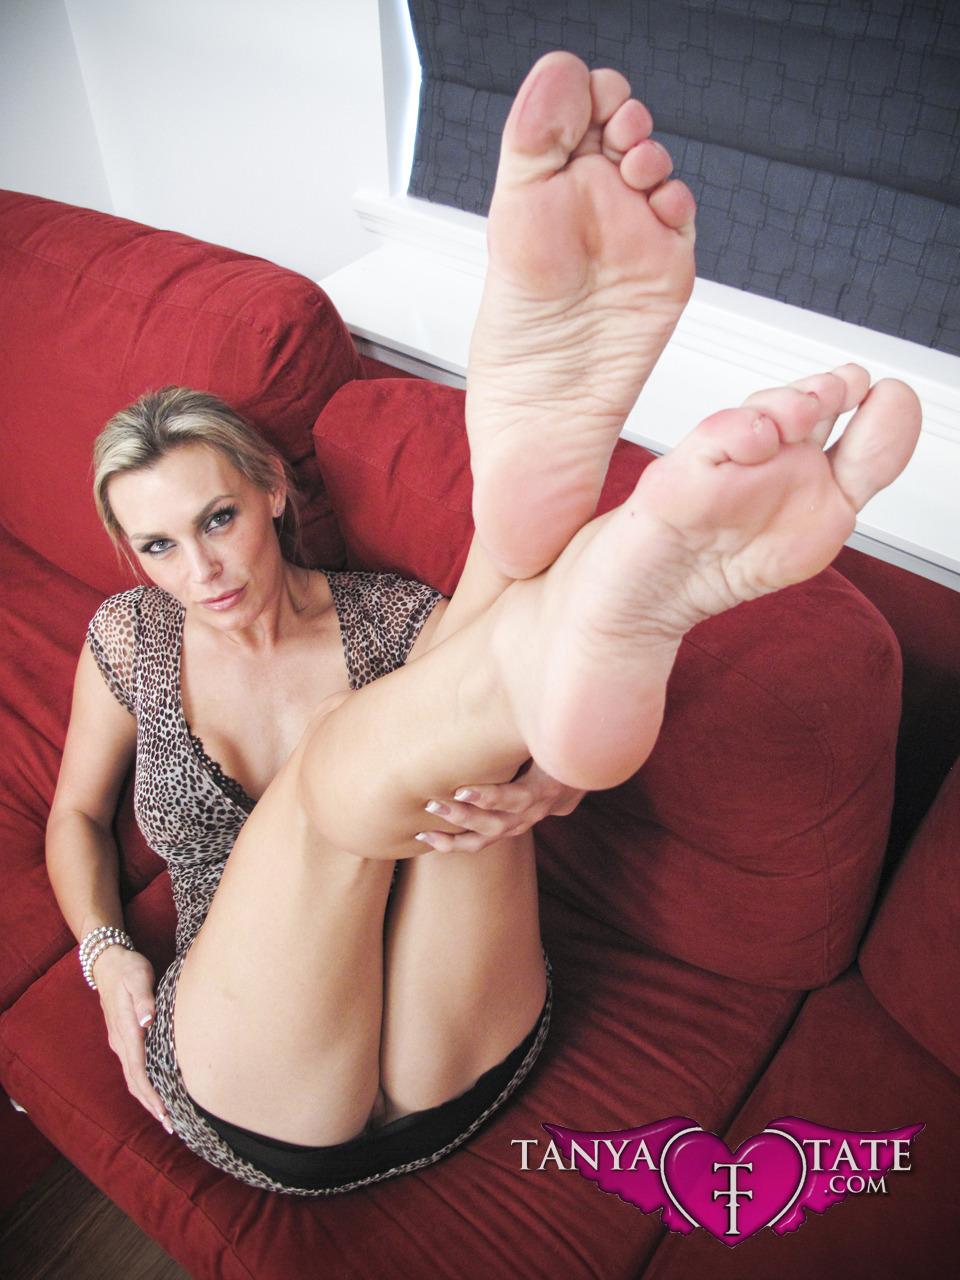 Tanya tate feet